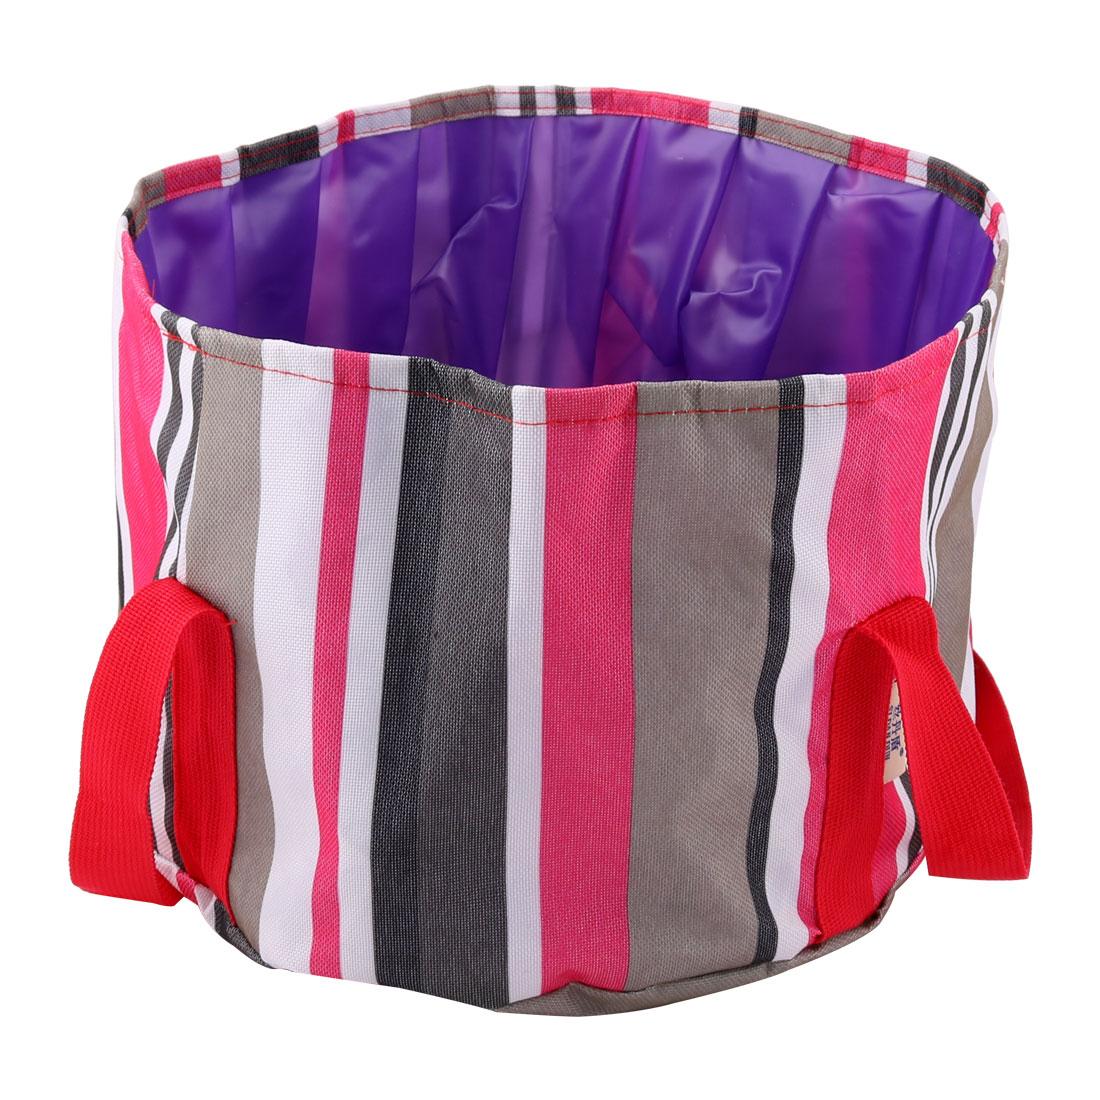 Outdoor Camping Stripe Pattern Portable Foldaway Fishing Bucket Washbasin Red